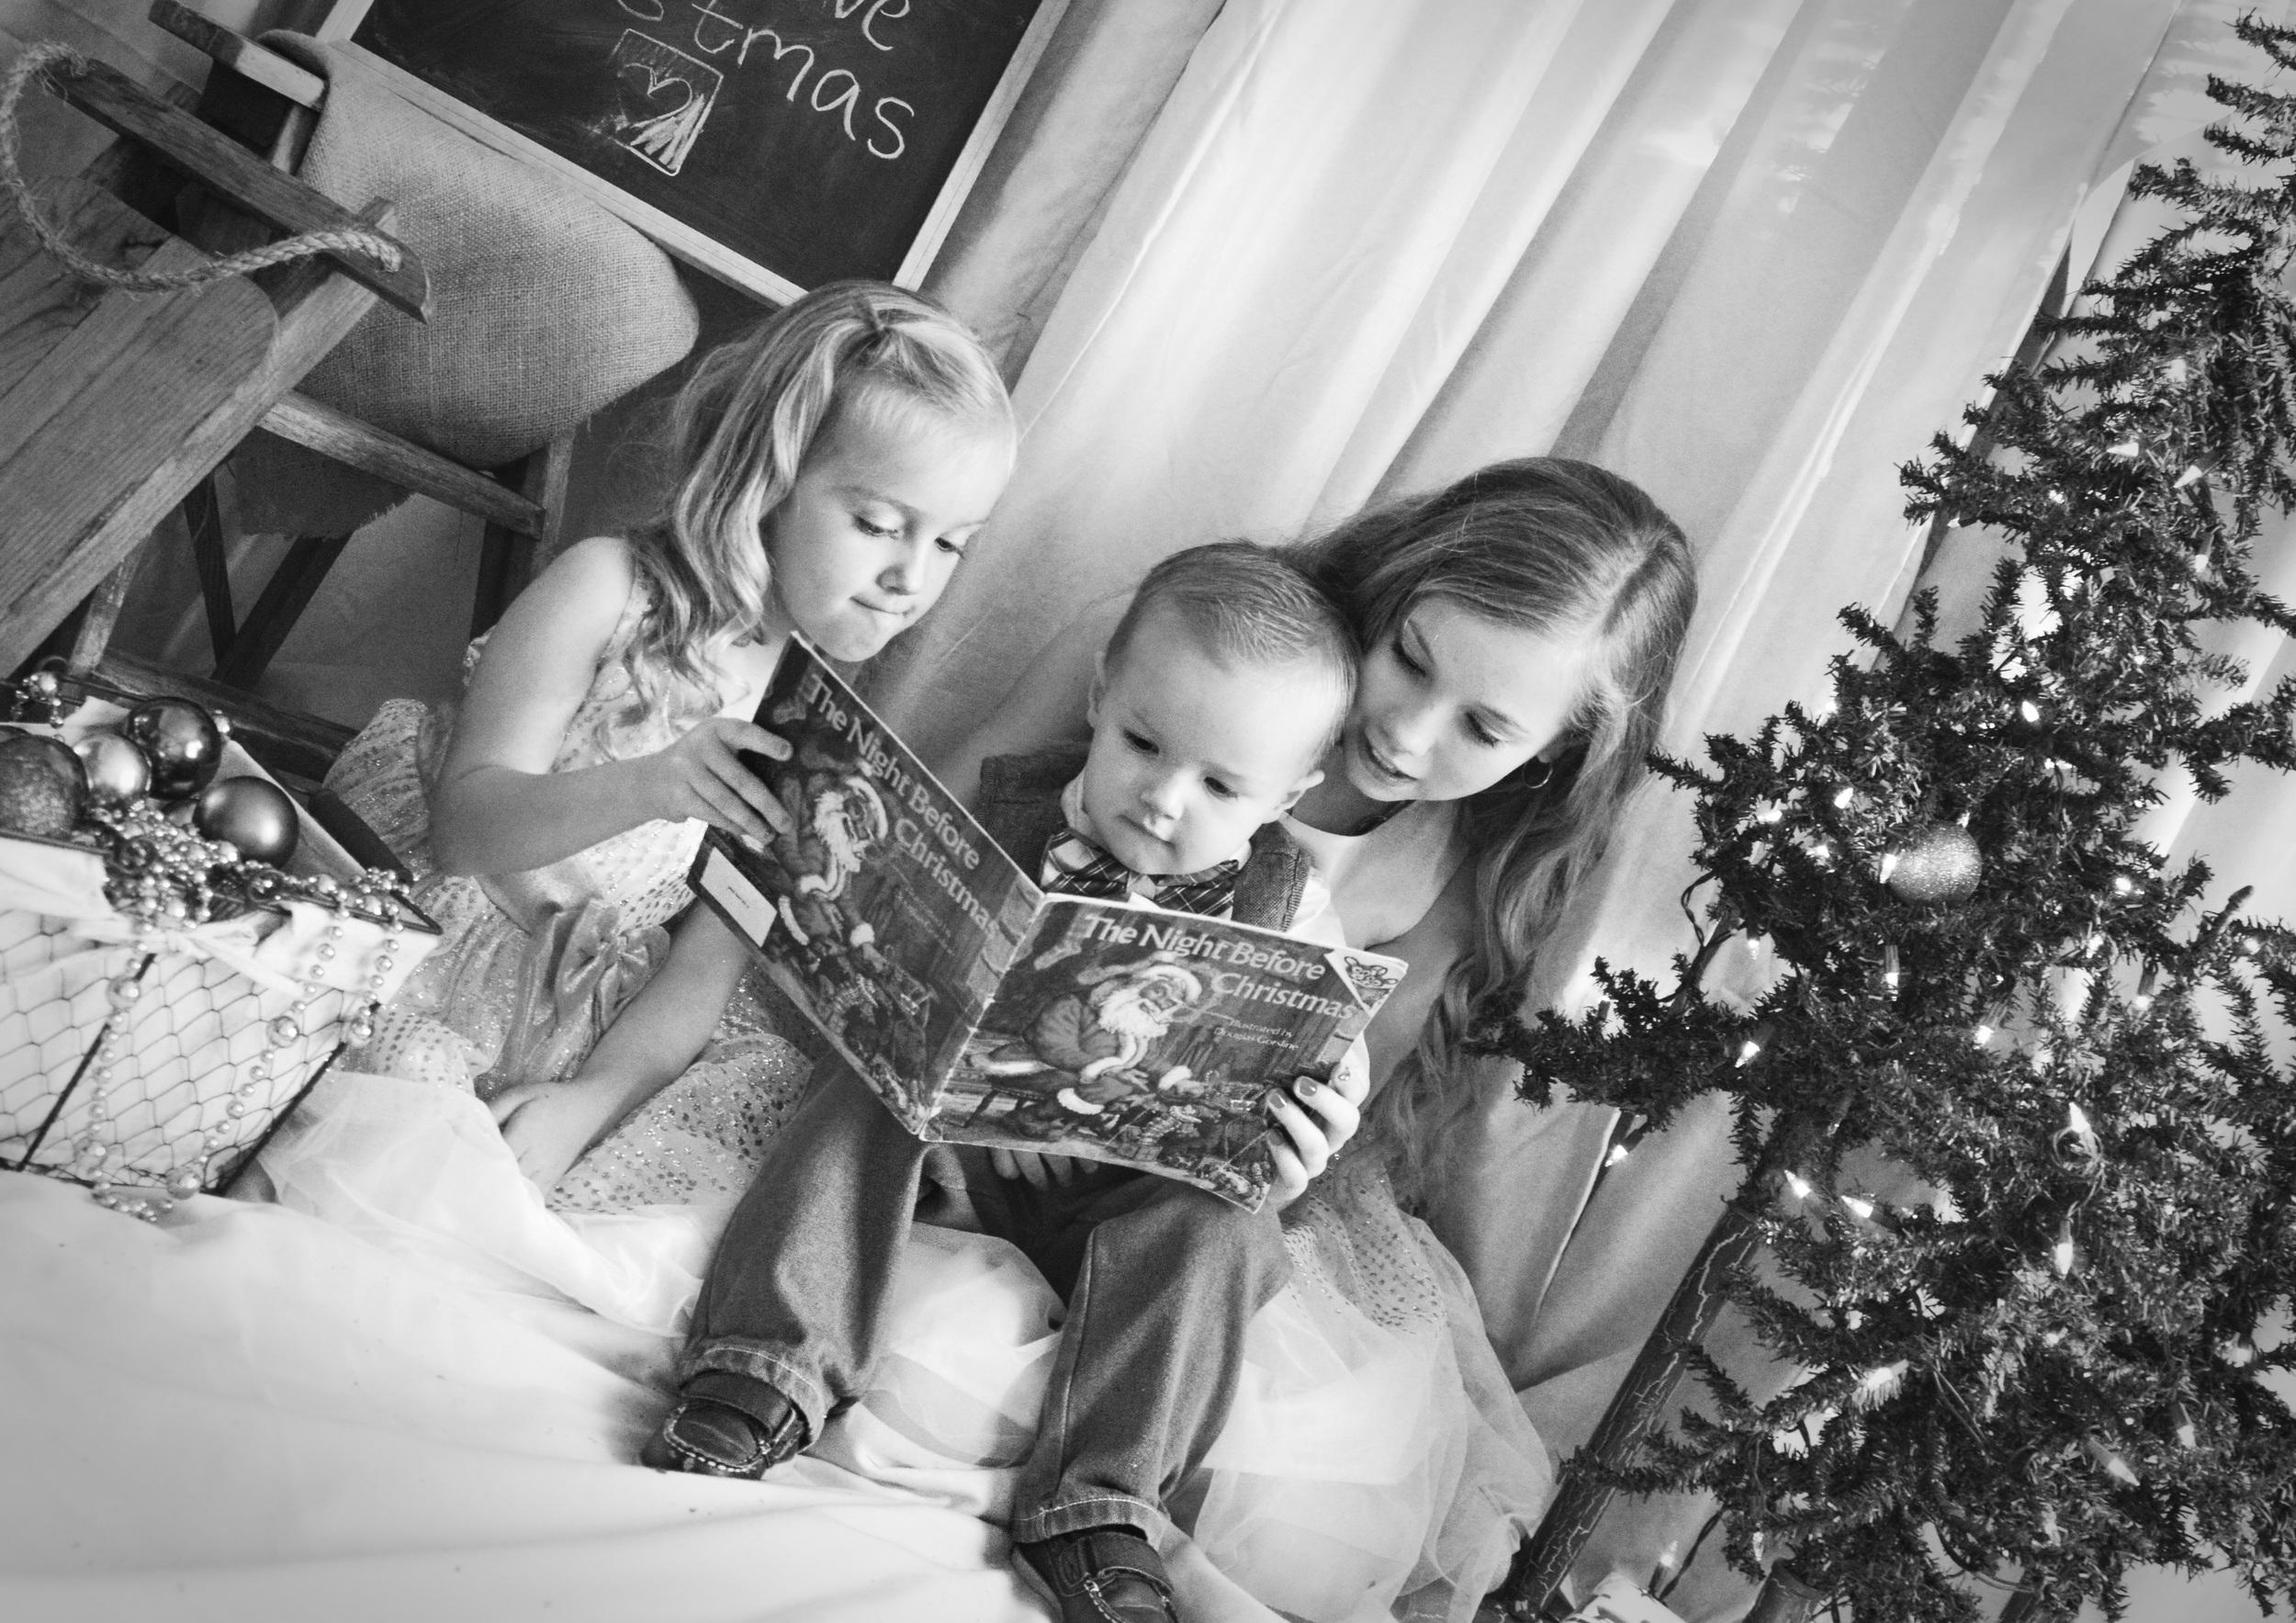 thenightbeforechristmas-siblingportraits-siblingphotography-childphotography-joplinmissouri-photosbyariel